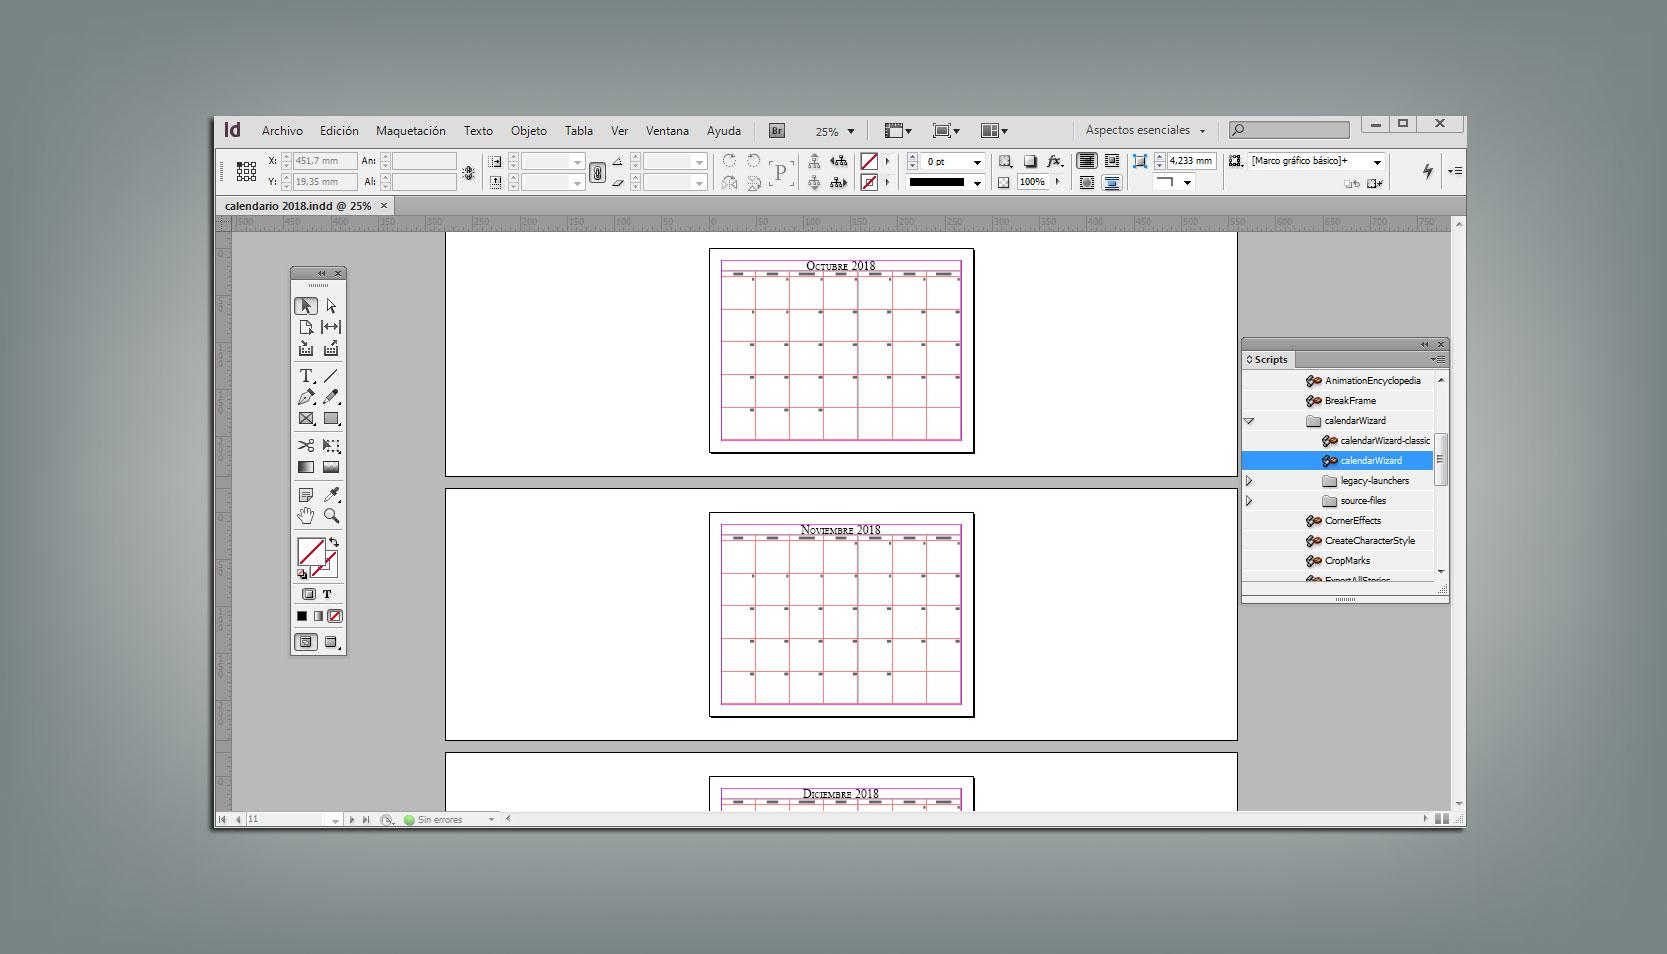 C mo hacer tu calendario 2018 para imprimir con indesign - Como hacer tu propio calendario ...